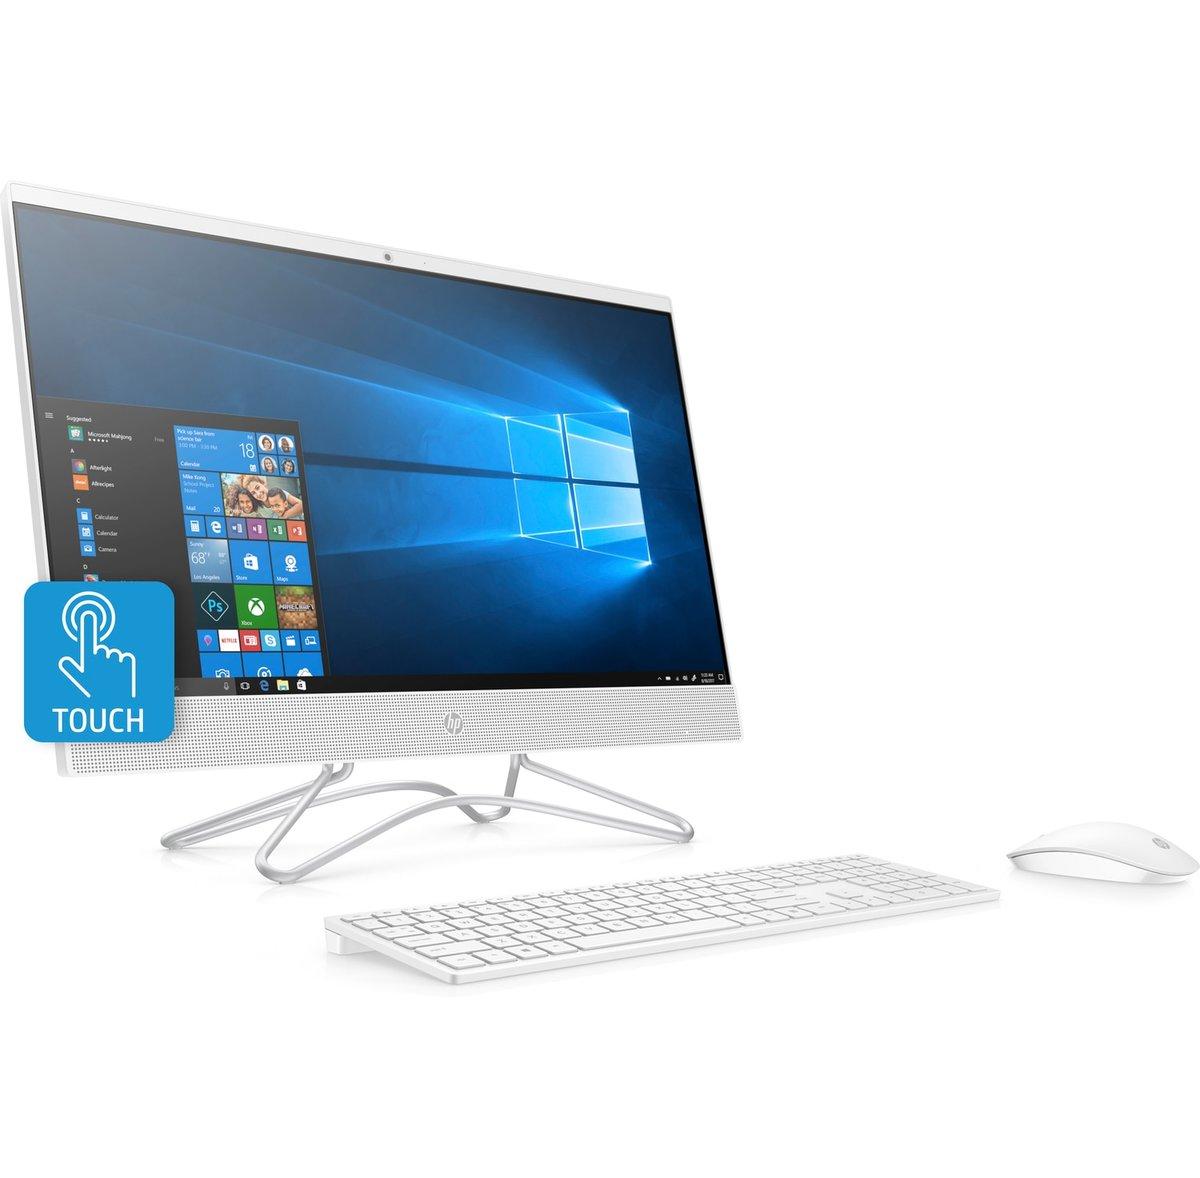 HP 24 f0046 All In One PC 23.8 Screen 7th Gen AMD A9 8GB Memory 1TB ...